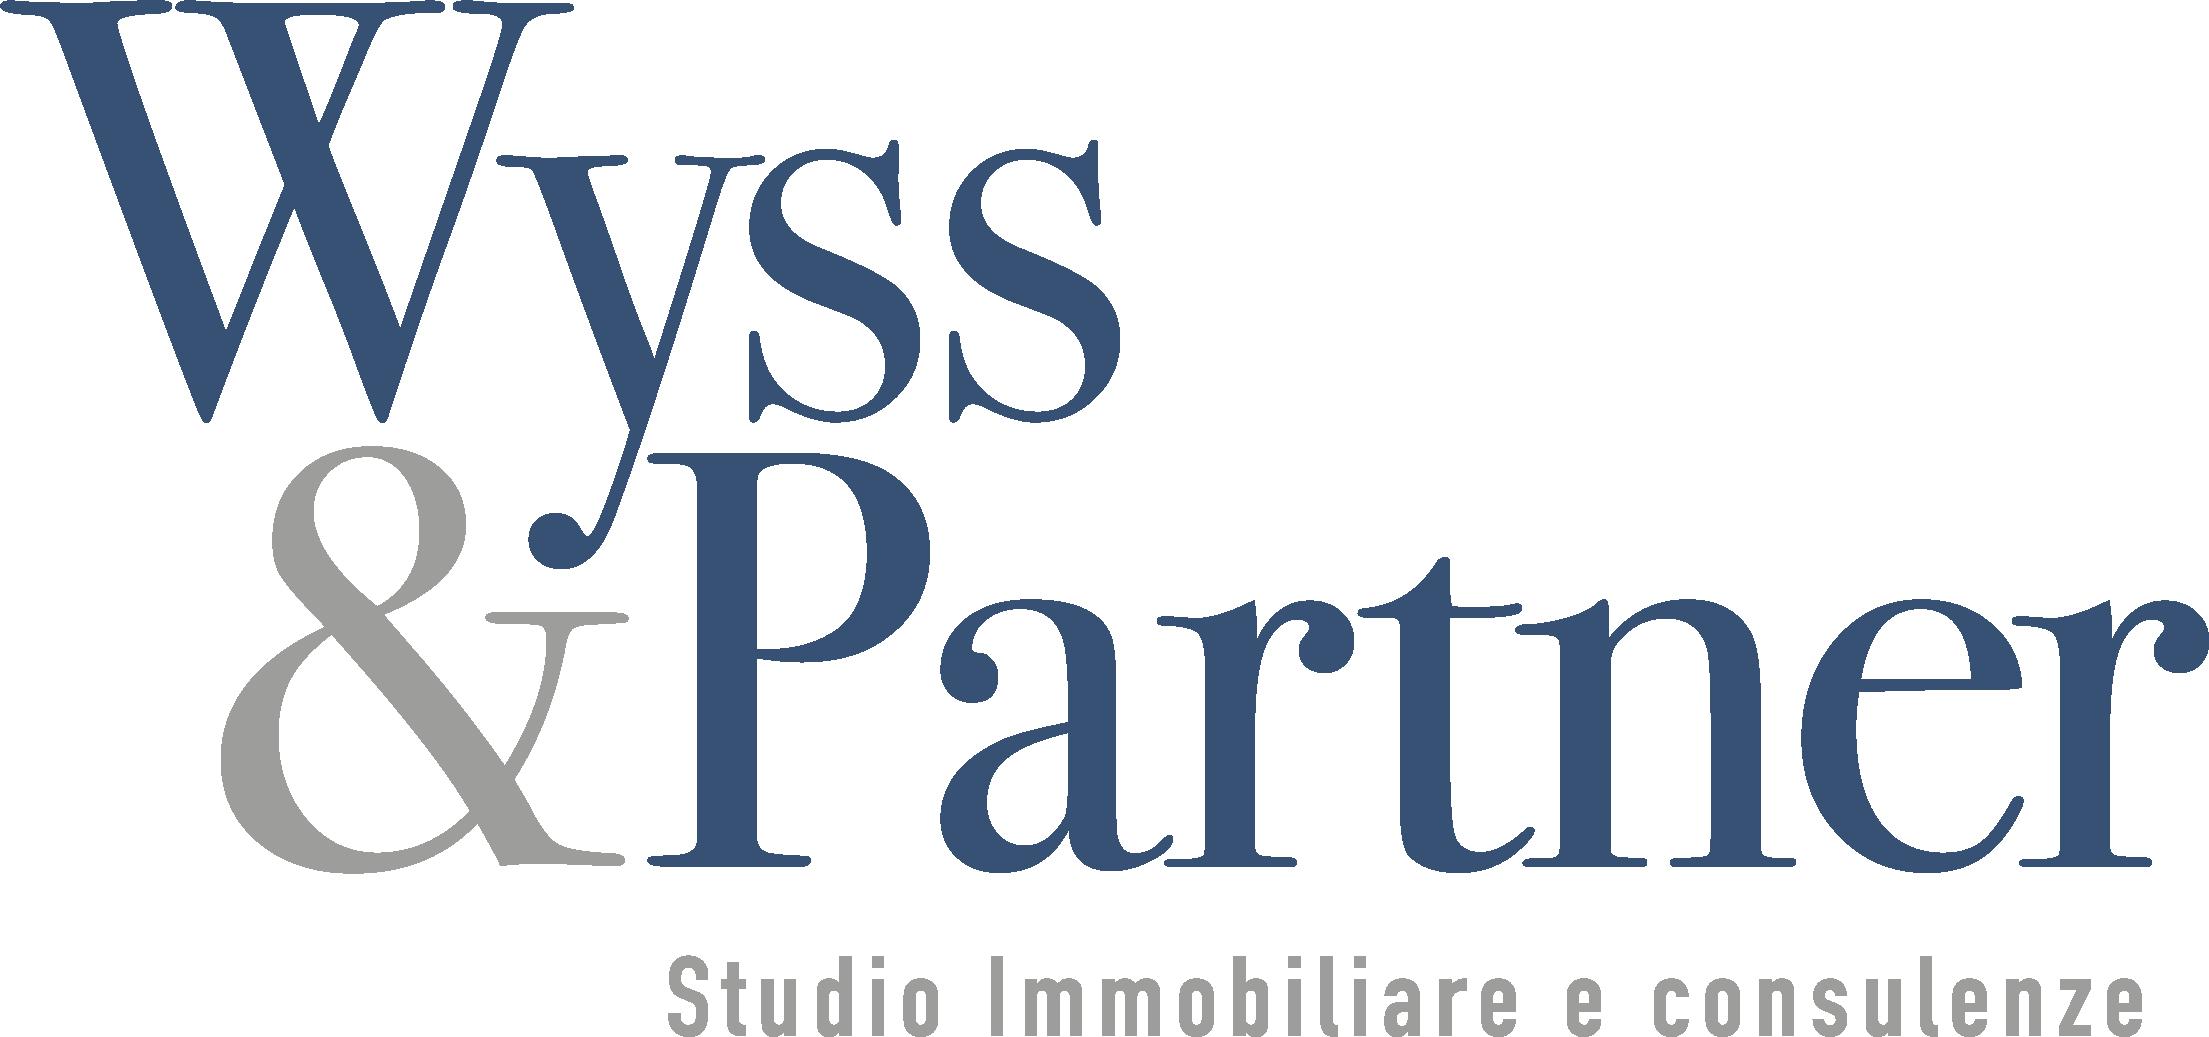 Wyss & Partner